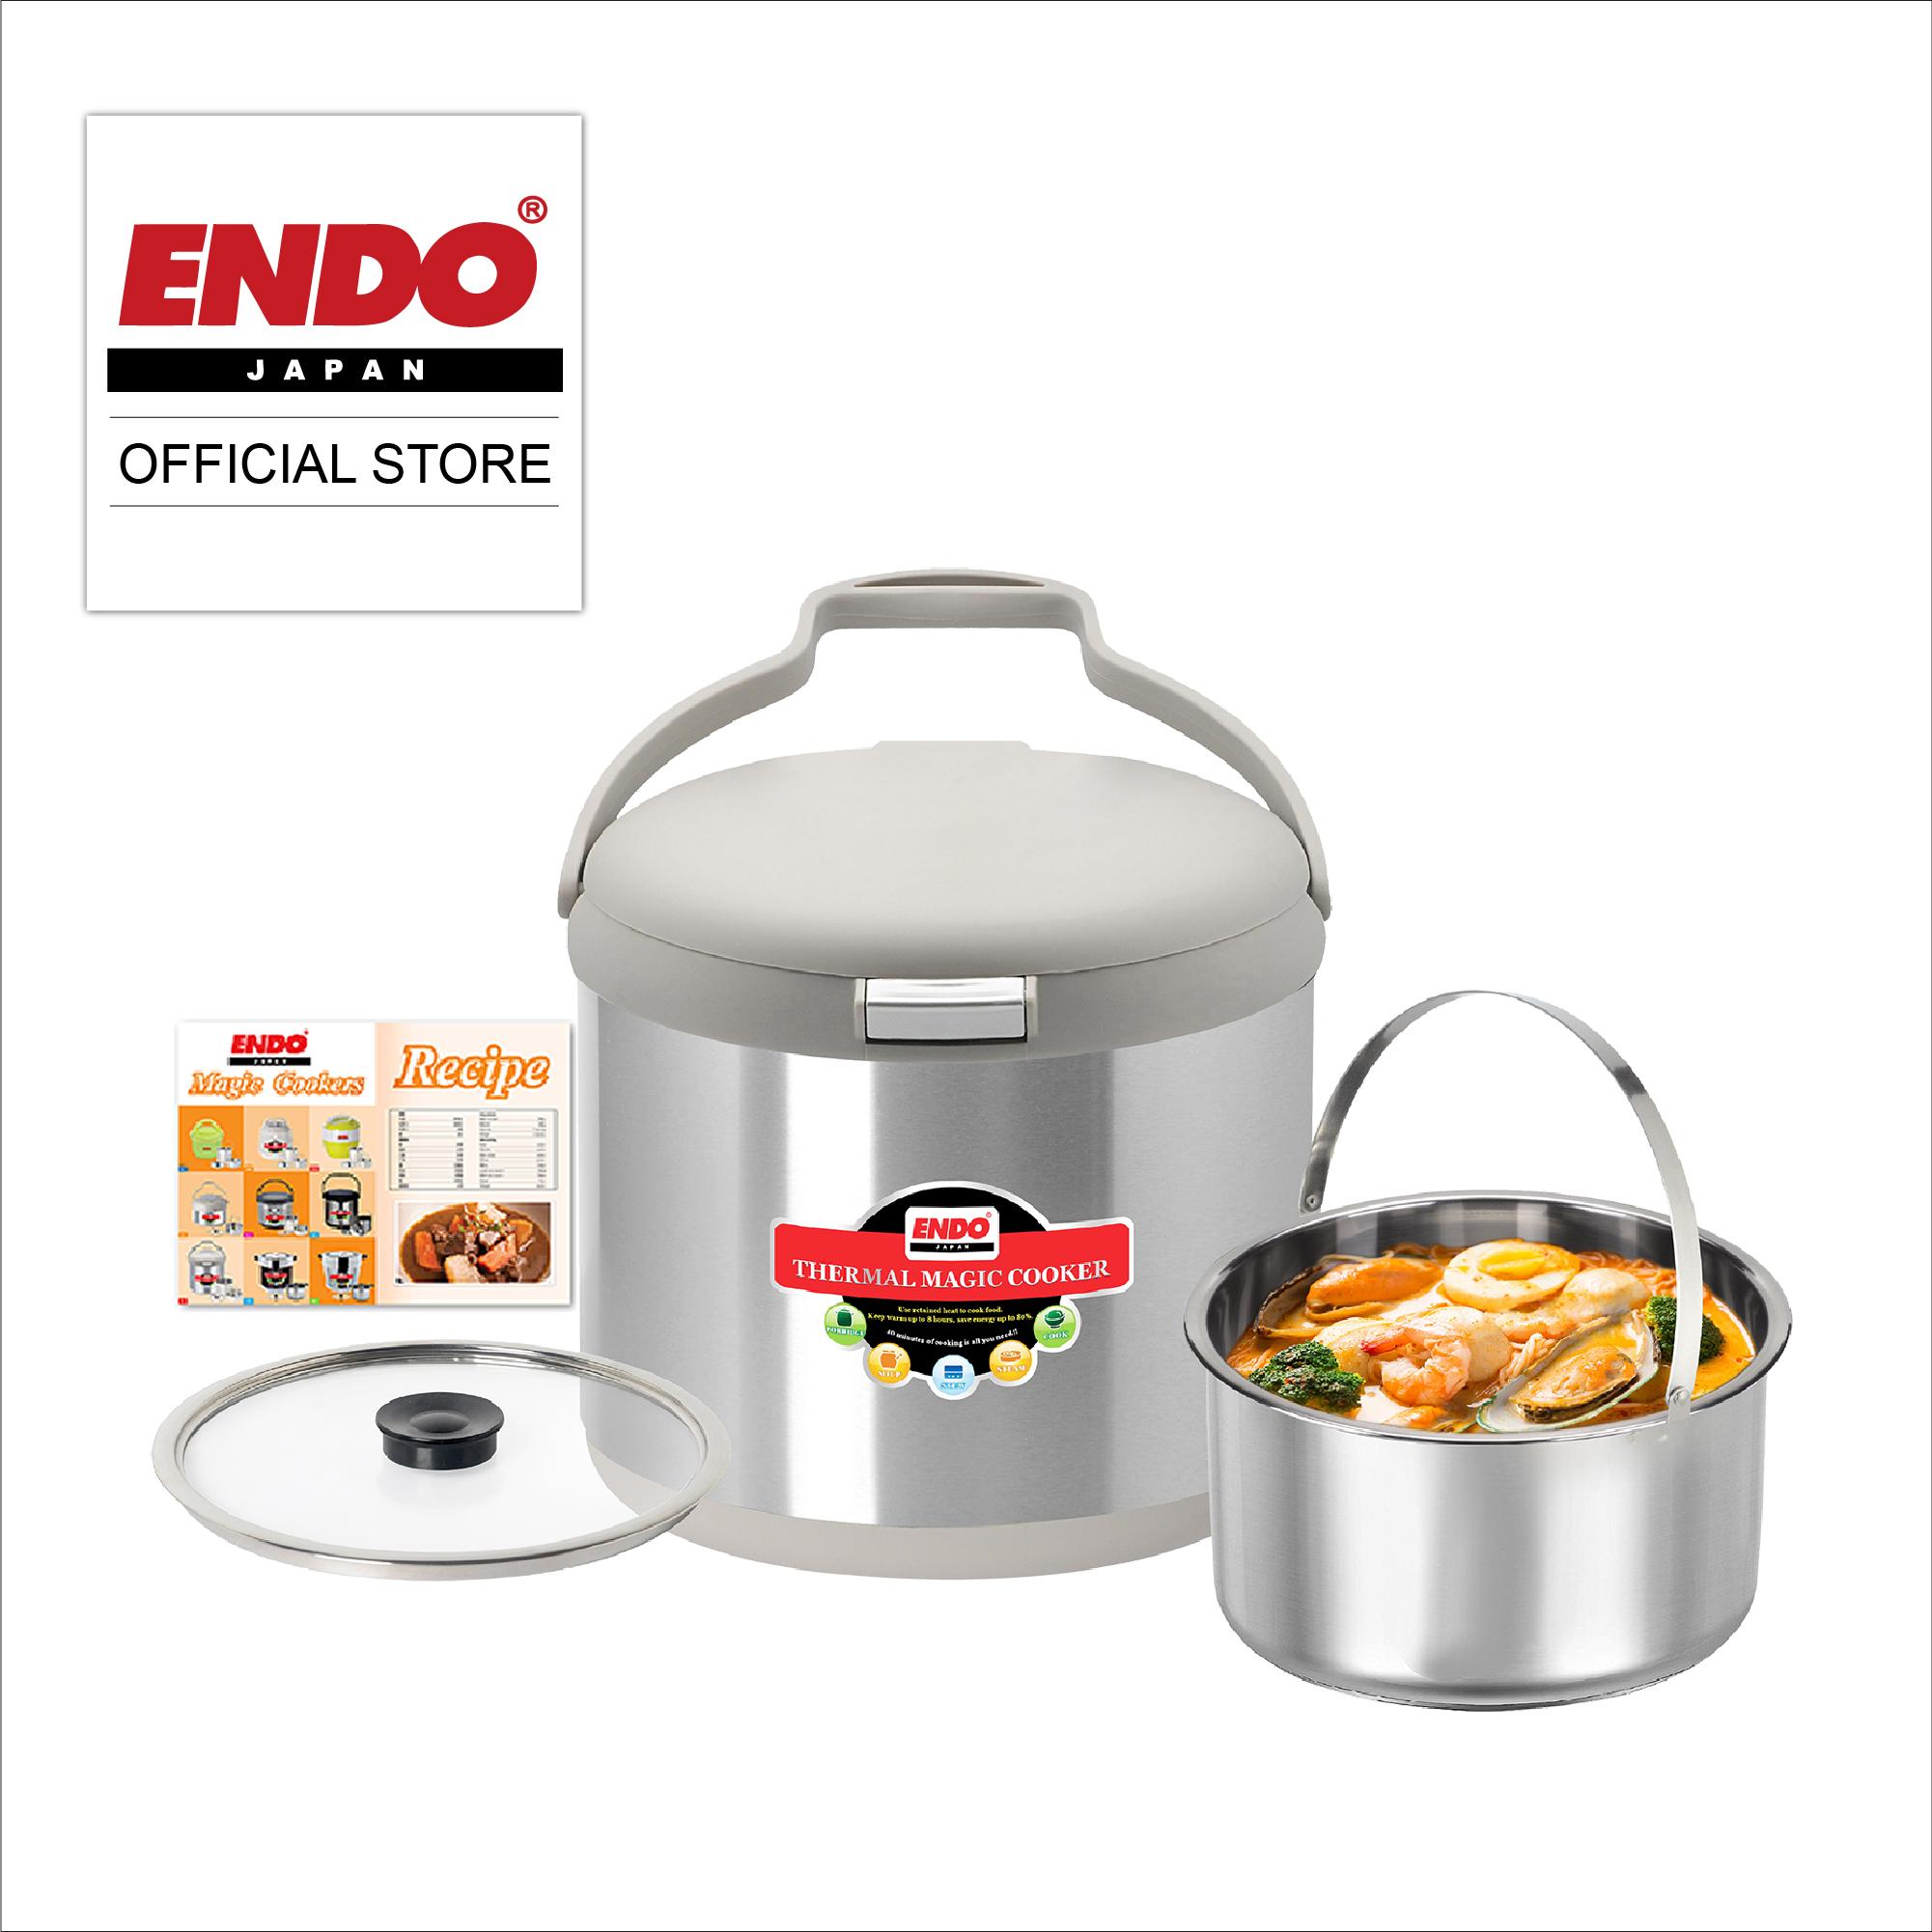 endo cookware japan tmc3 lazada 5l thermal cooker singapore magic pan